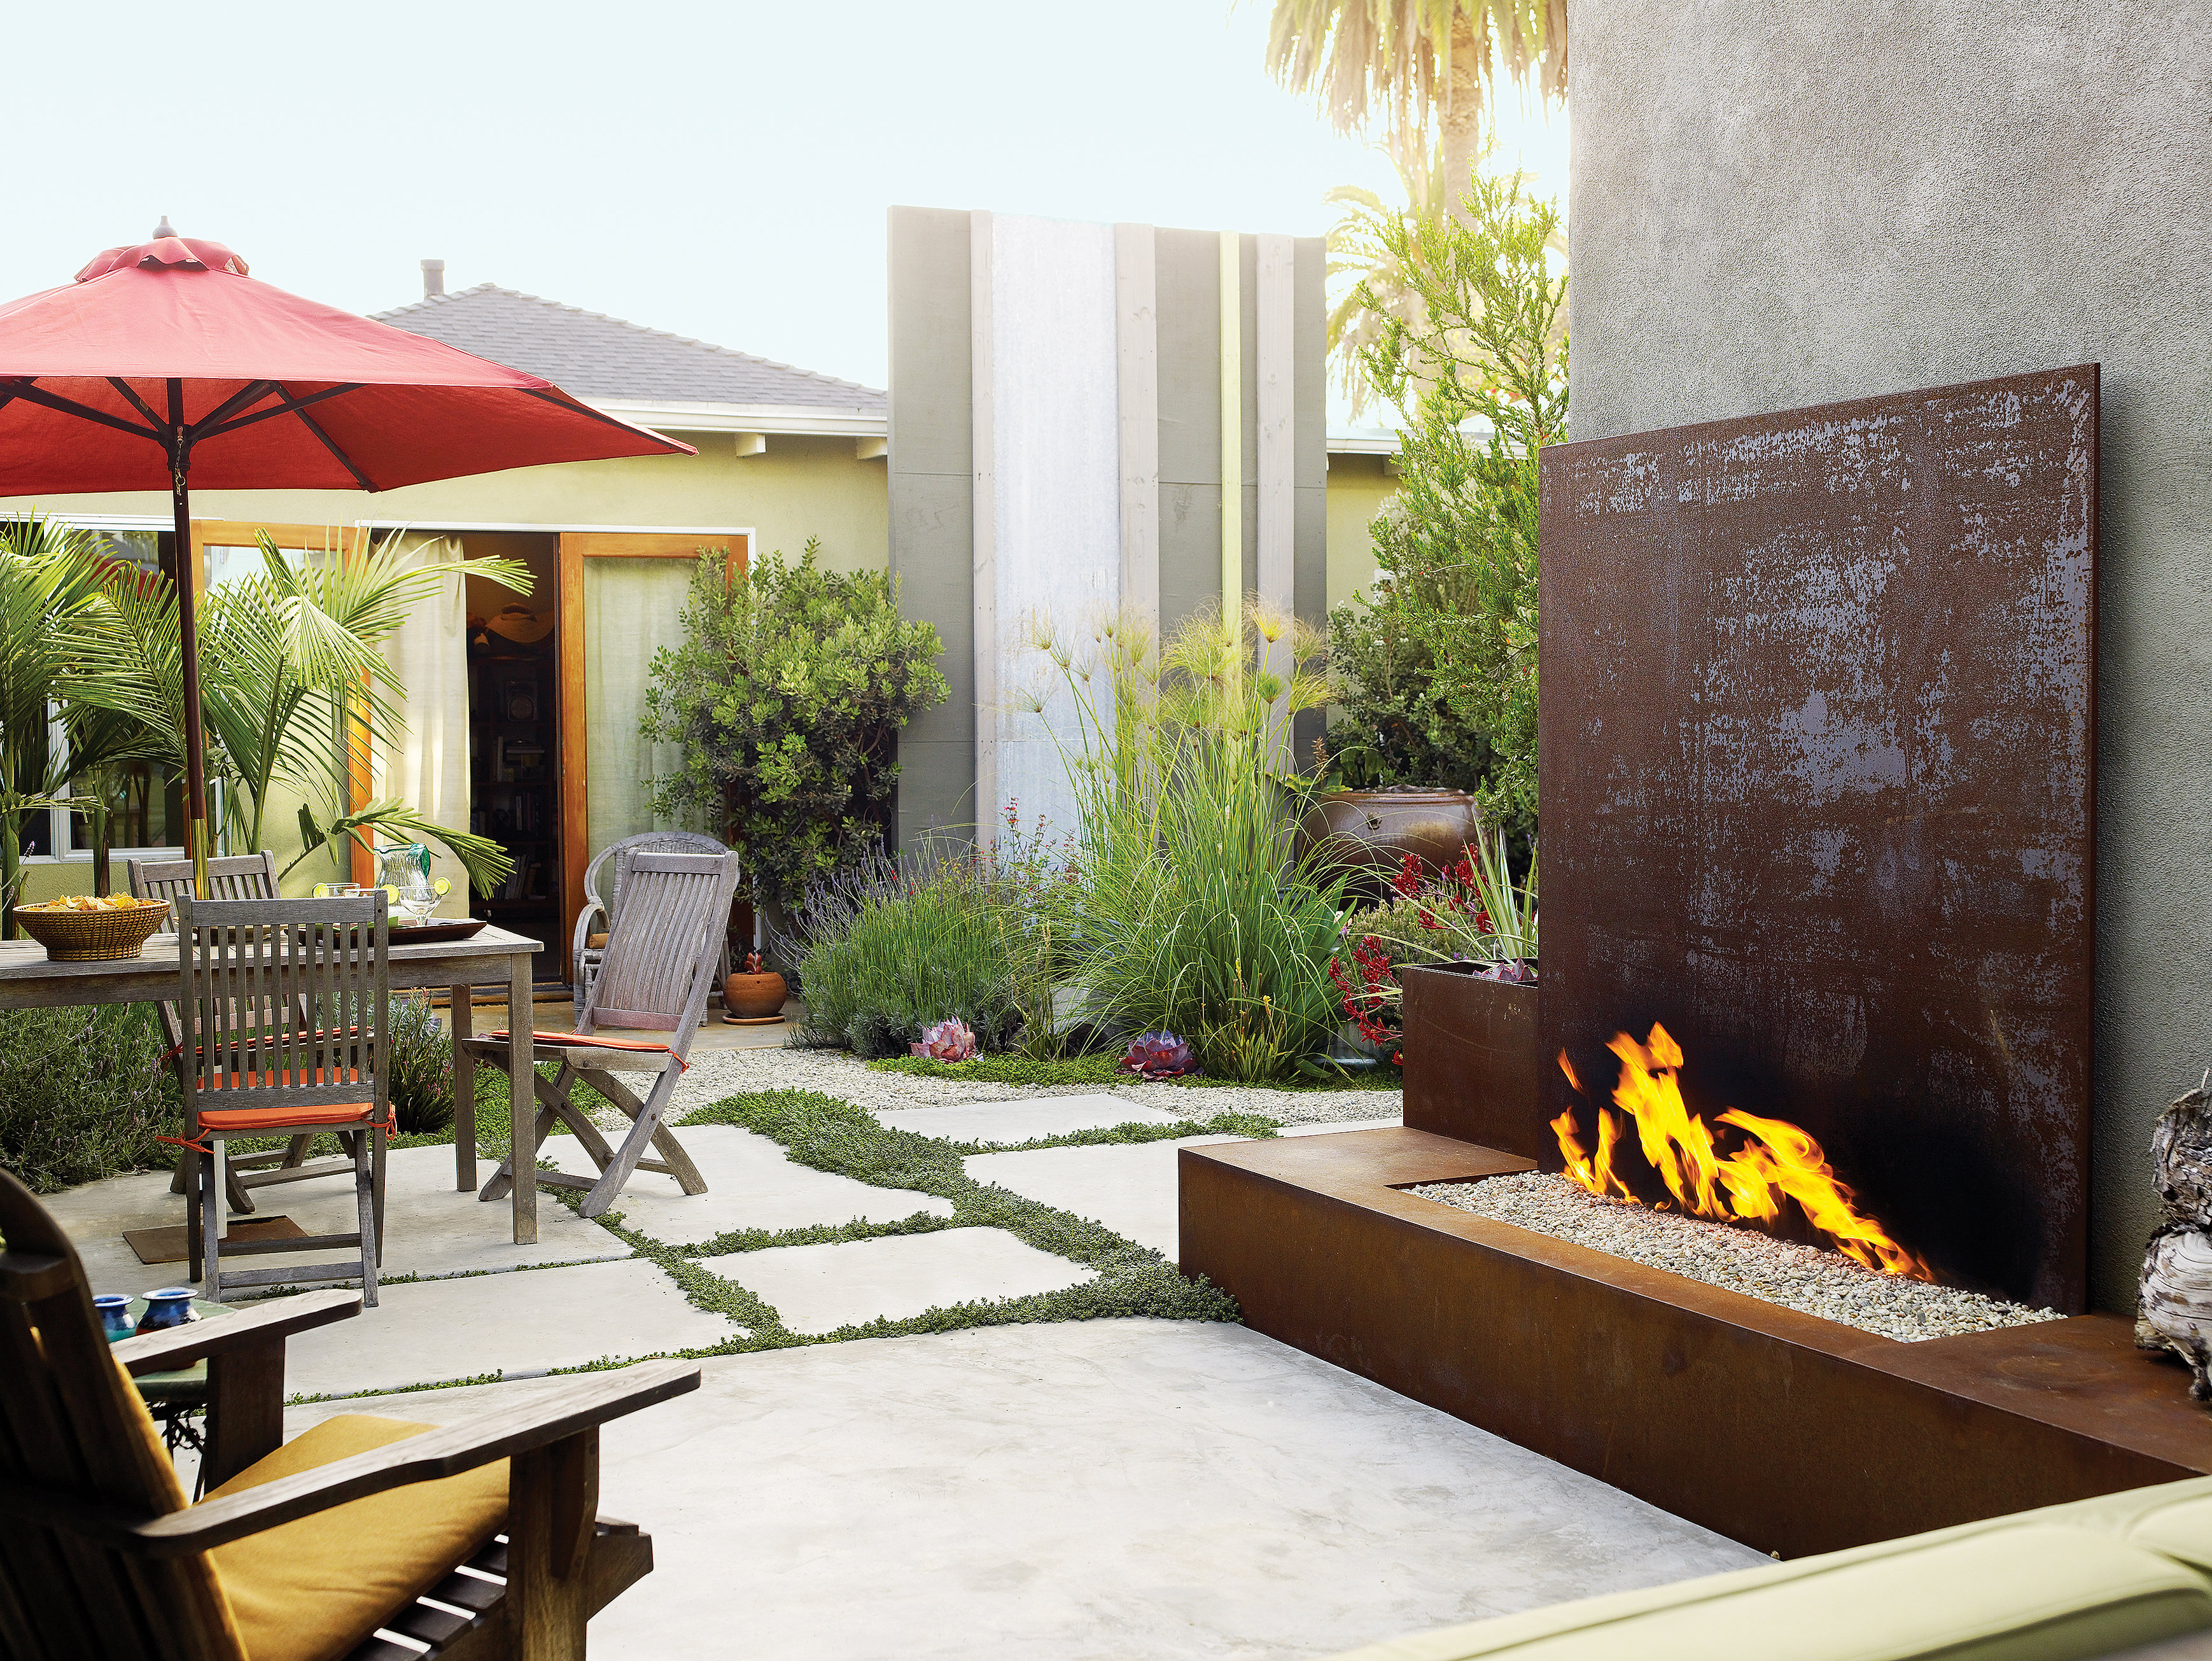 landscaping ideas with stone sunset magazine rh sunset com